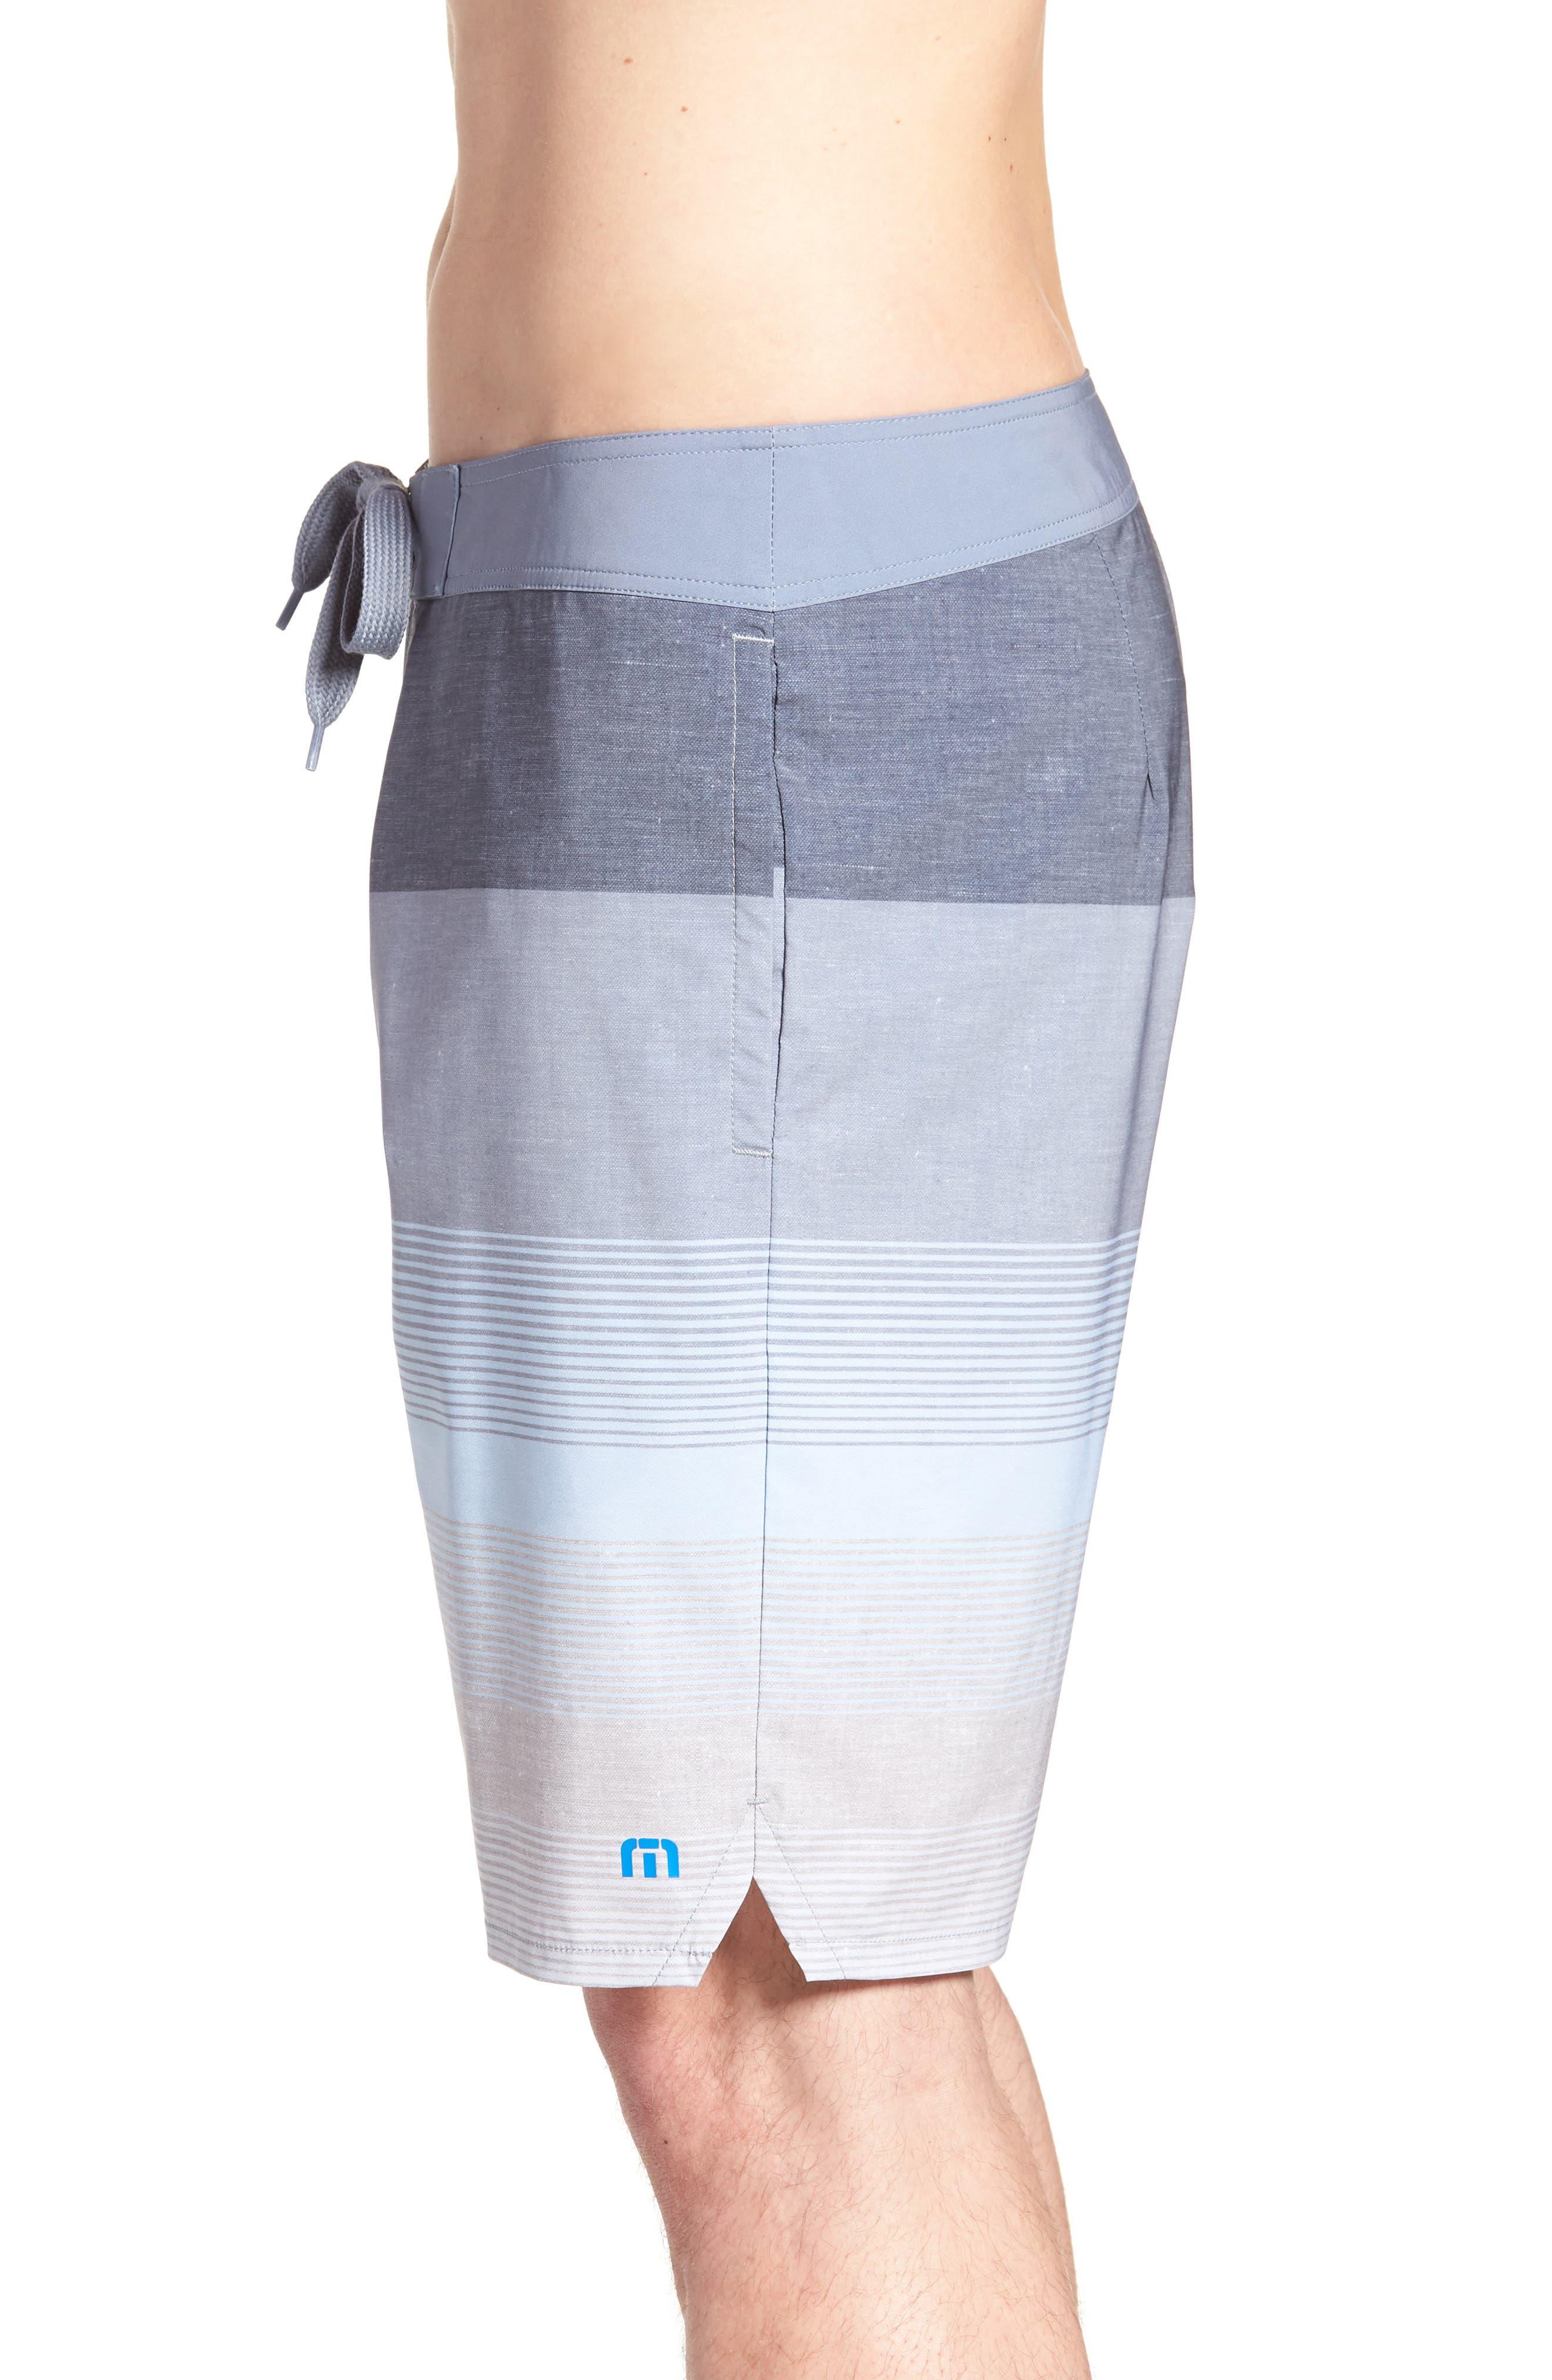 Seegrid Regular Fit Board Shorts,                             Alternate thumbnail 3, color,                             401